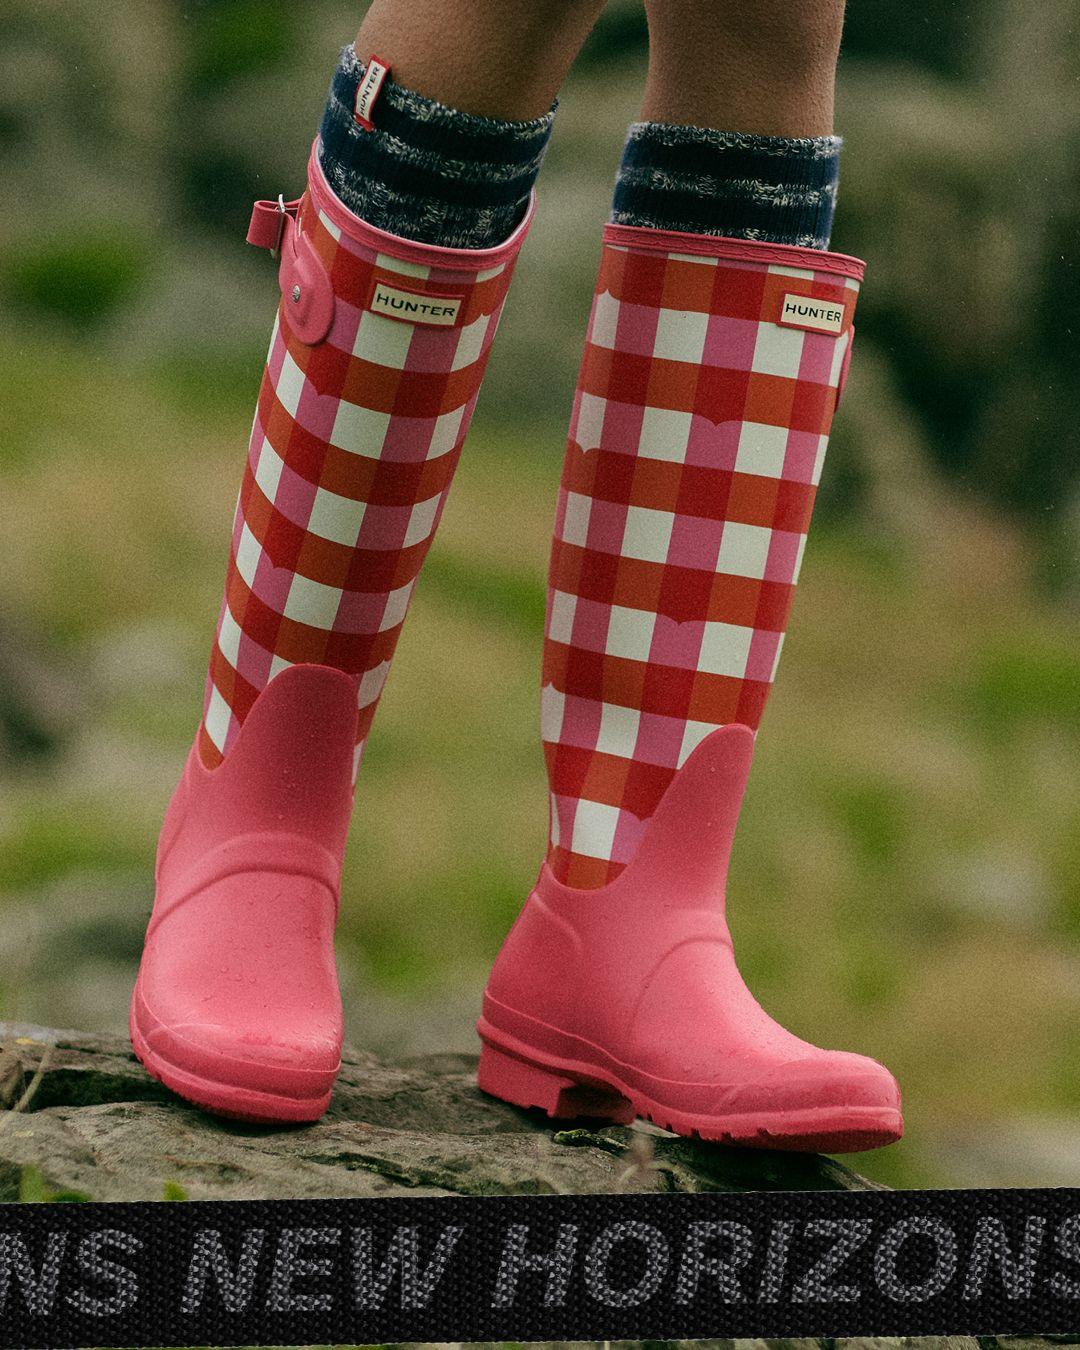 Ladies Mud Rocks Blue Grey Striped Wellington Boots Wellies Adjustable Buckles 7